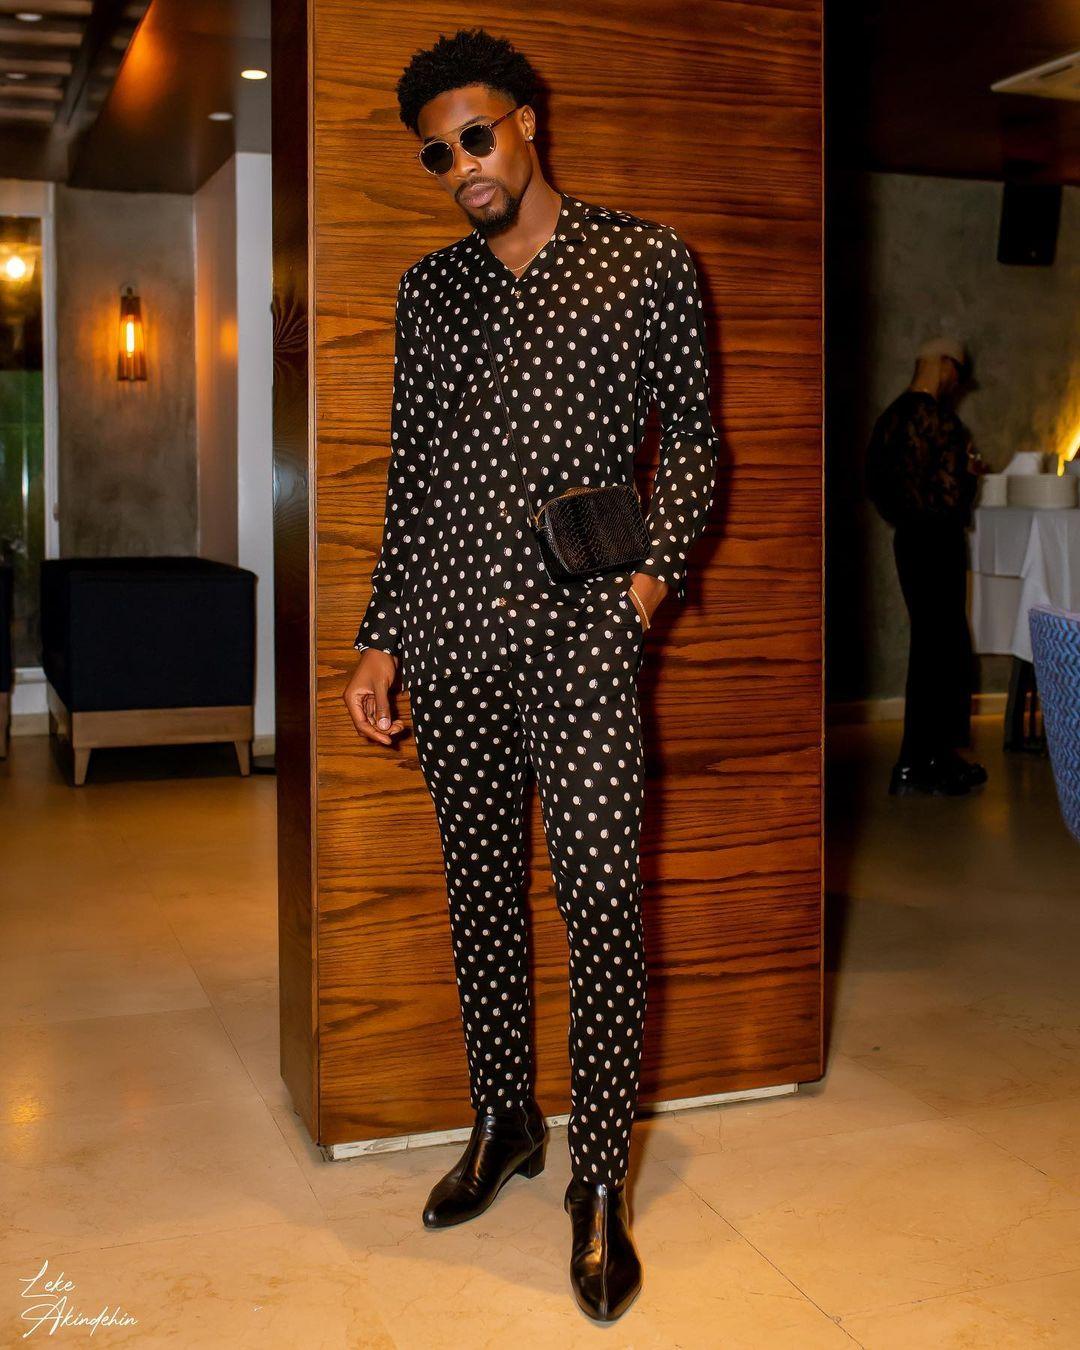 world-best-dressed-black-male-men-celebrities-influencers-style-rave